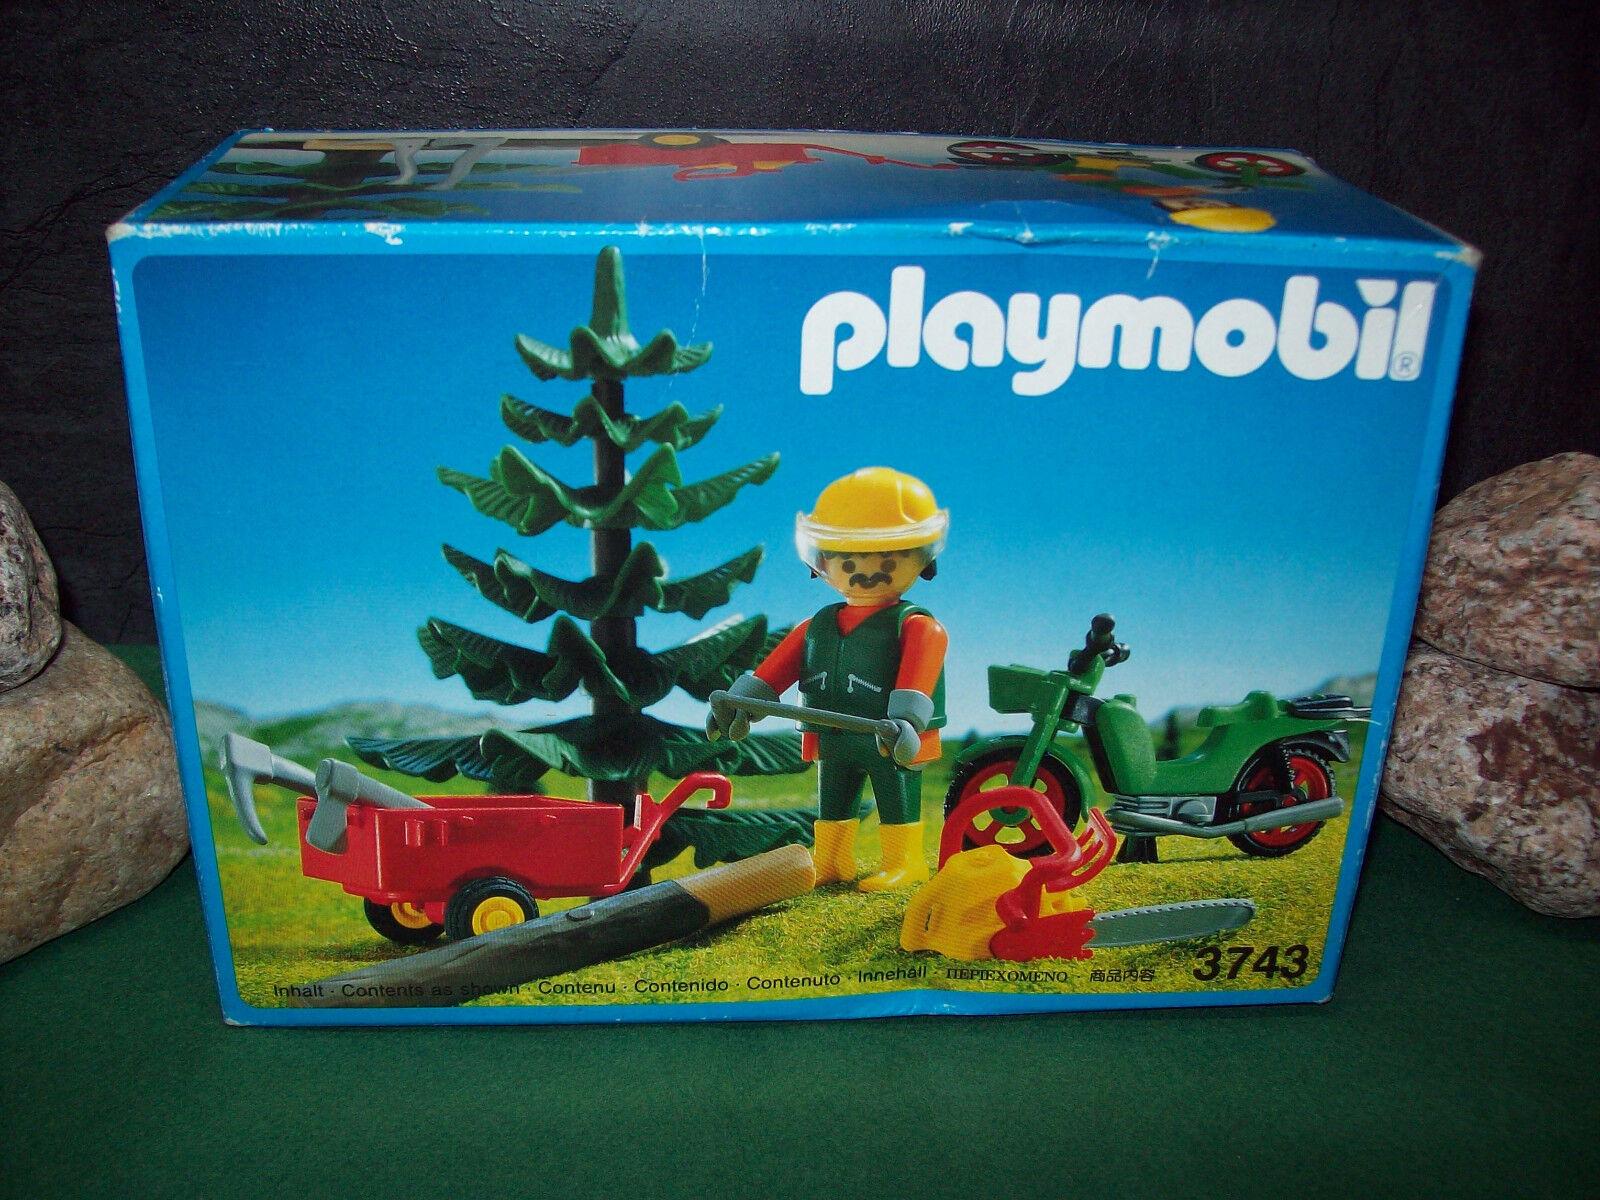 Playmobil Rarität Waldarbeiter 3743-A 1993, komplett in ungeöffn. OVP